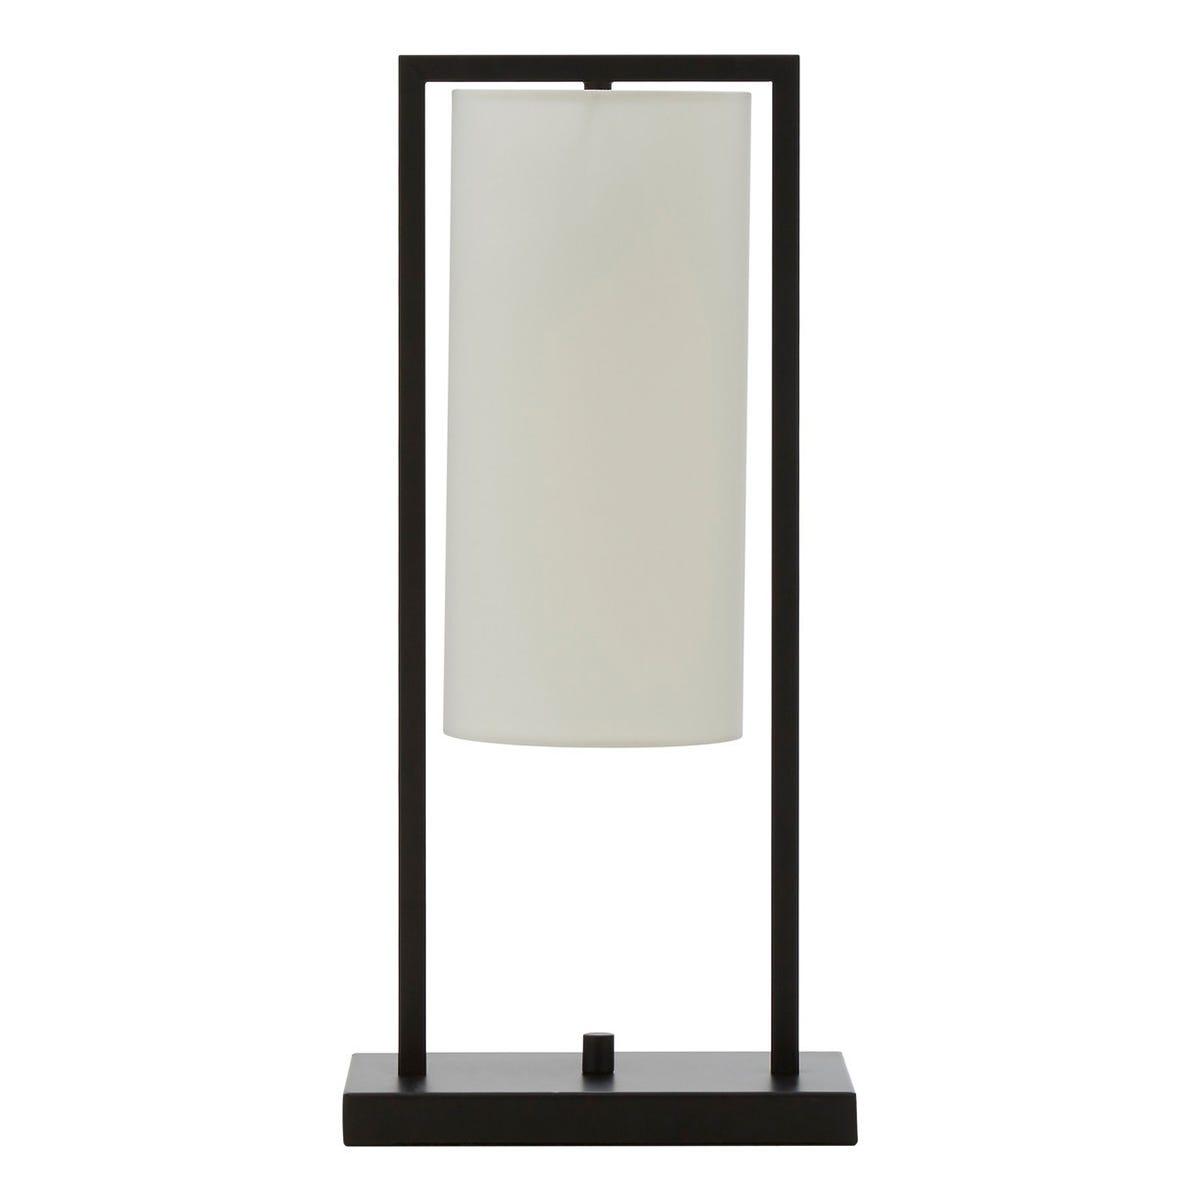 Interiors By Premier Table Lamp - Black Base/White Linen Shade